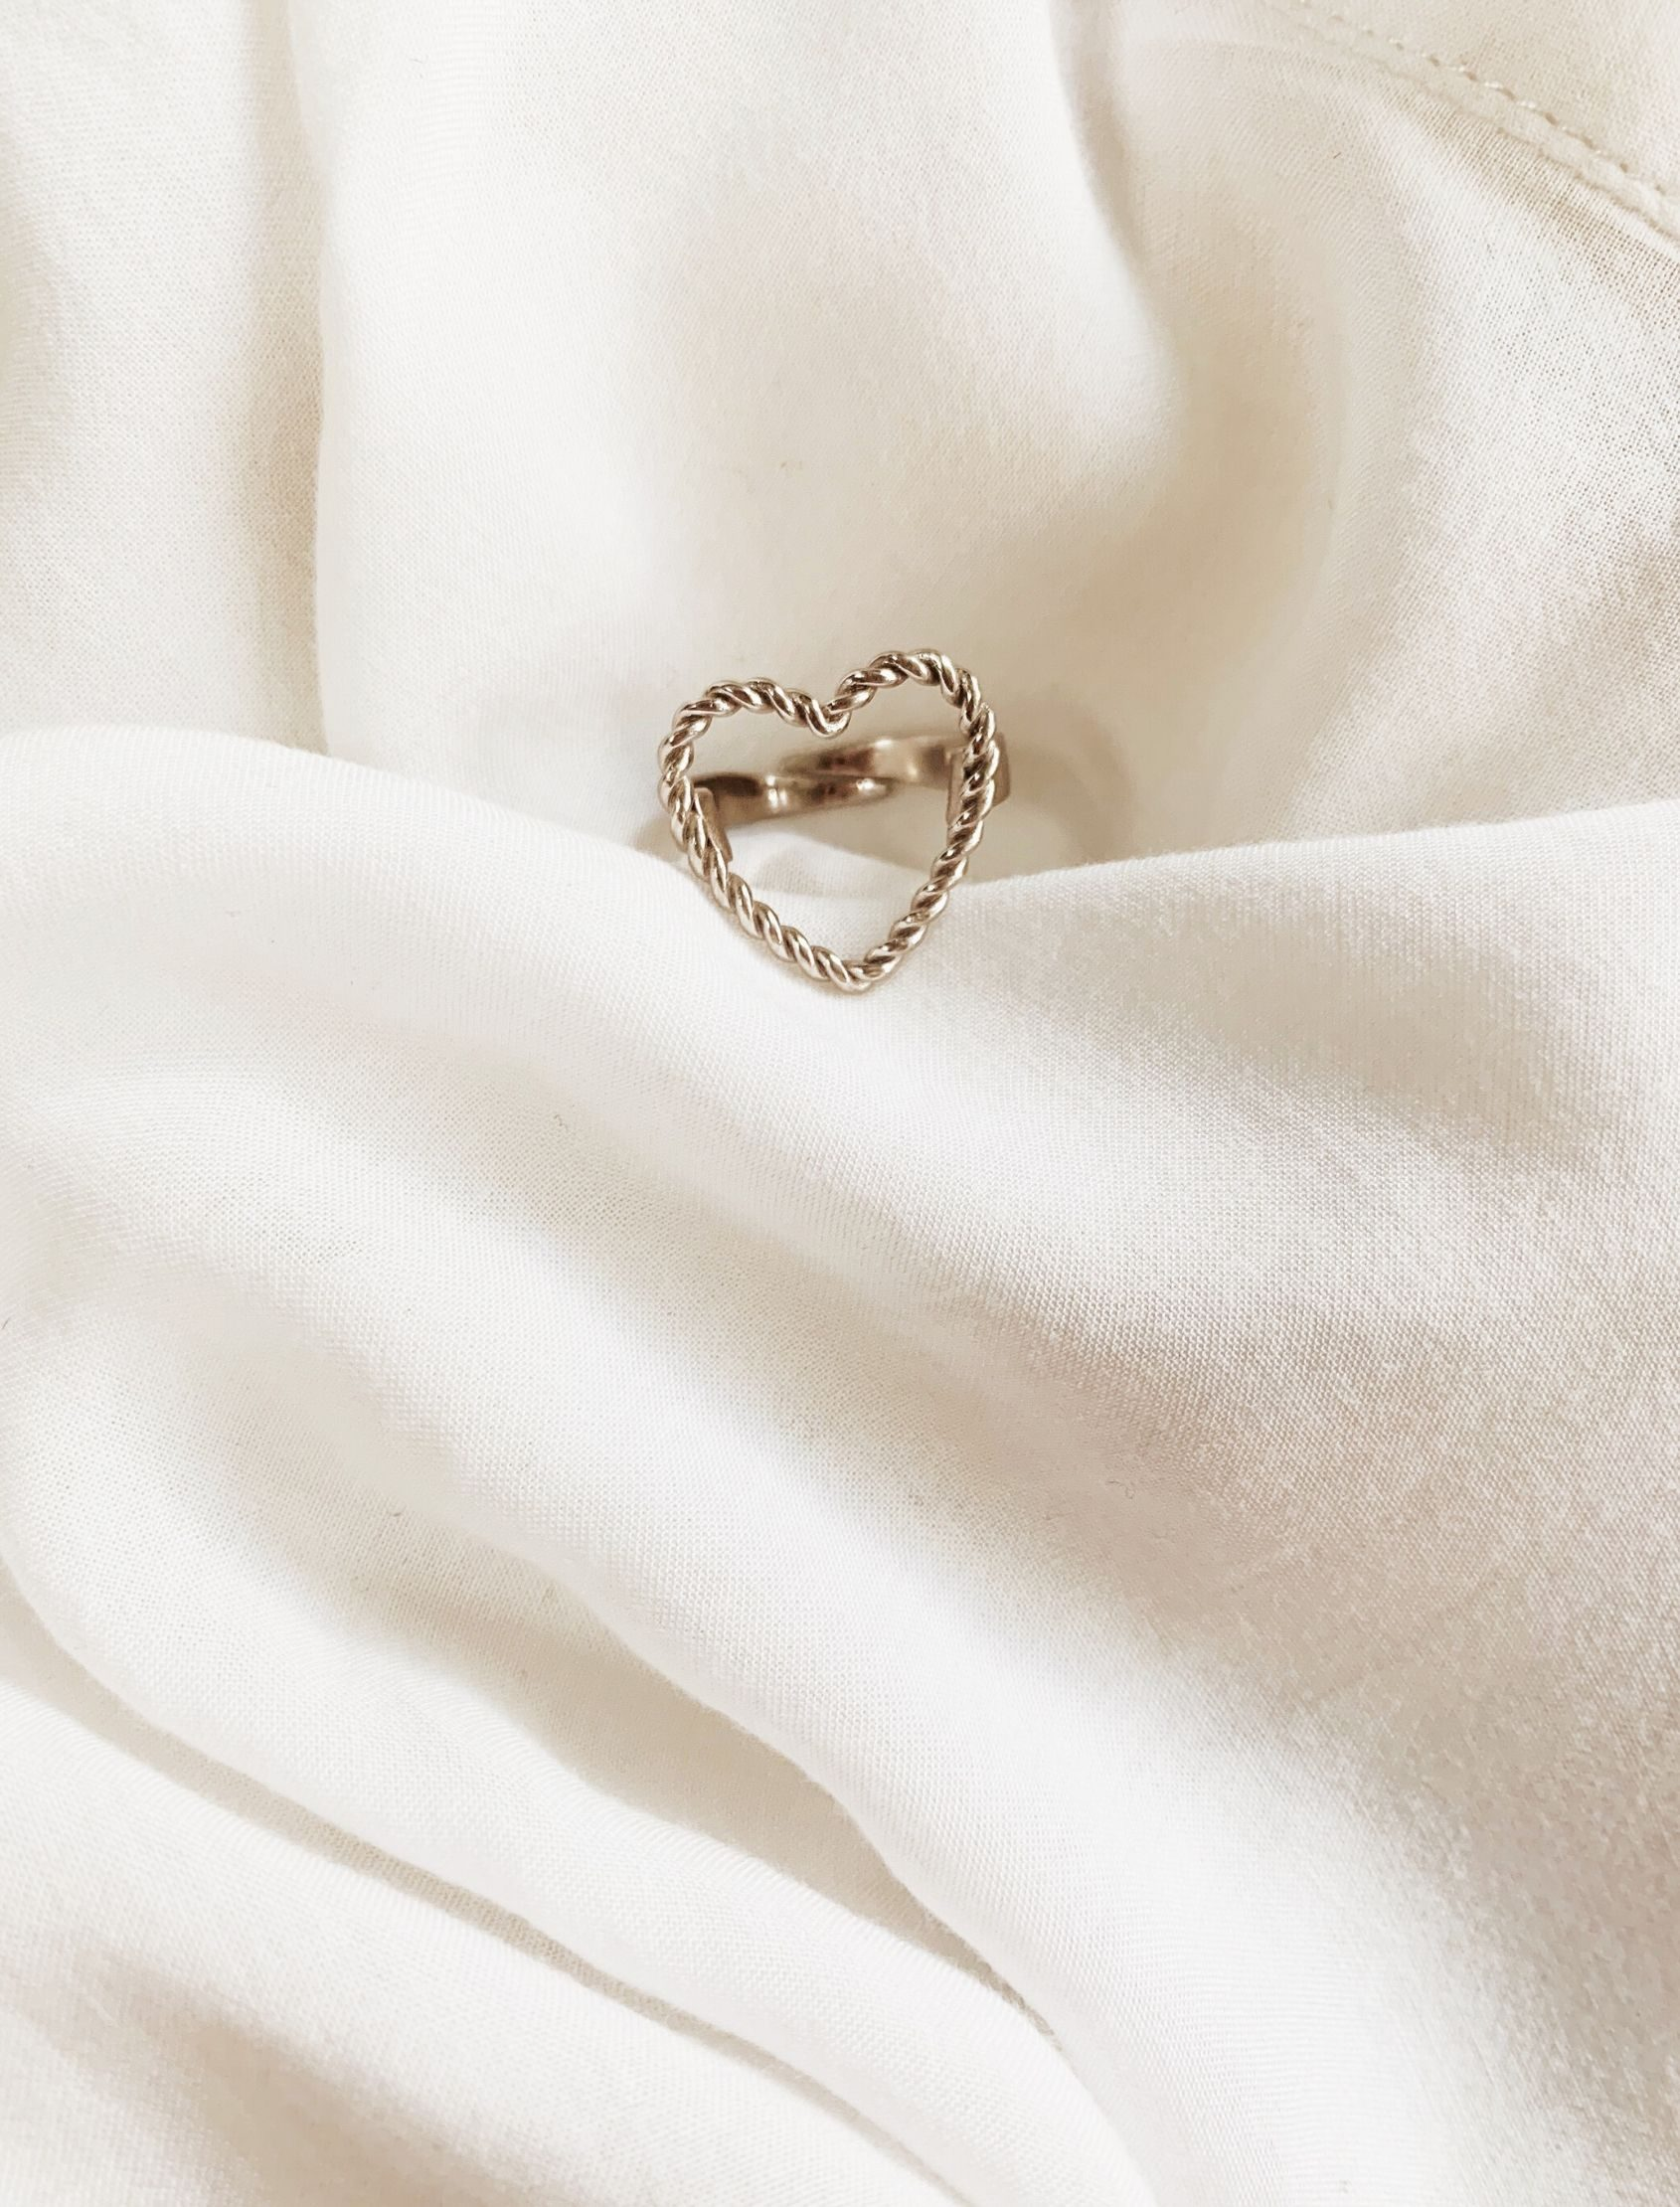 anillo lof con forma de corazon en plata de ley de maria cala store